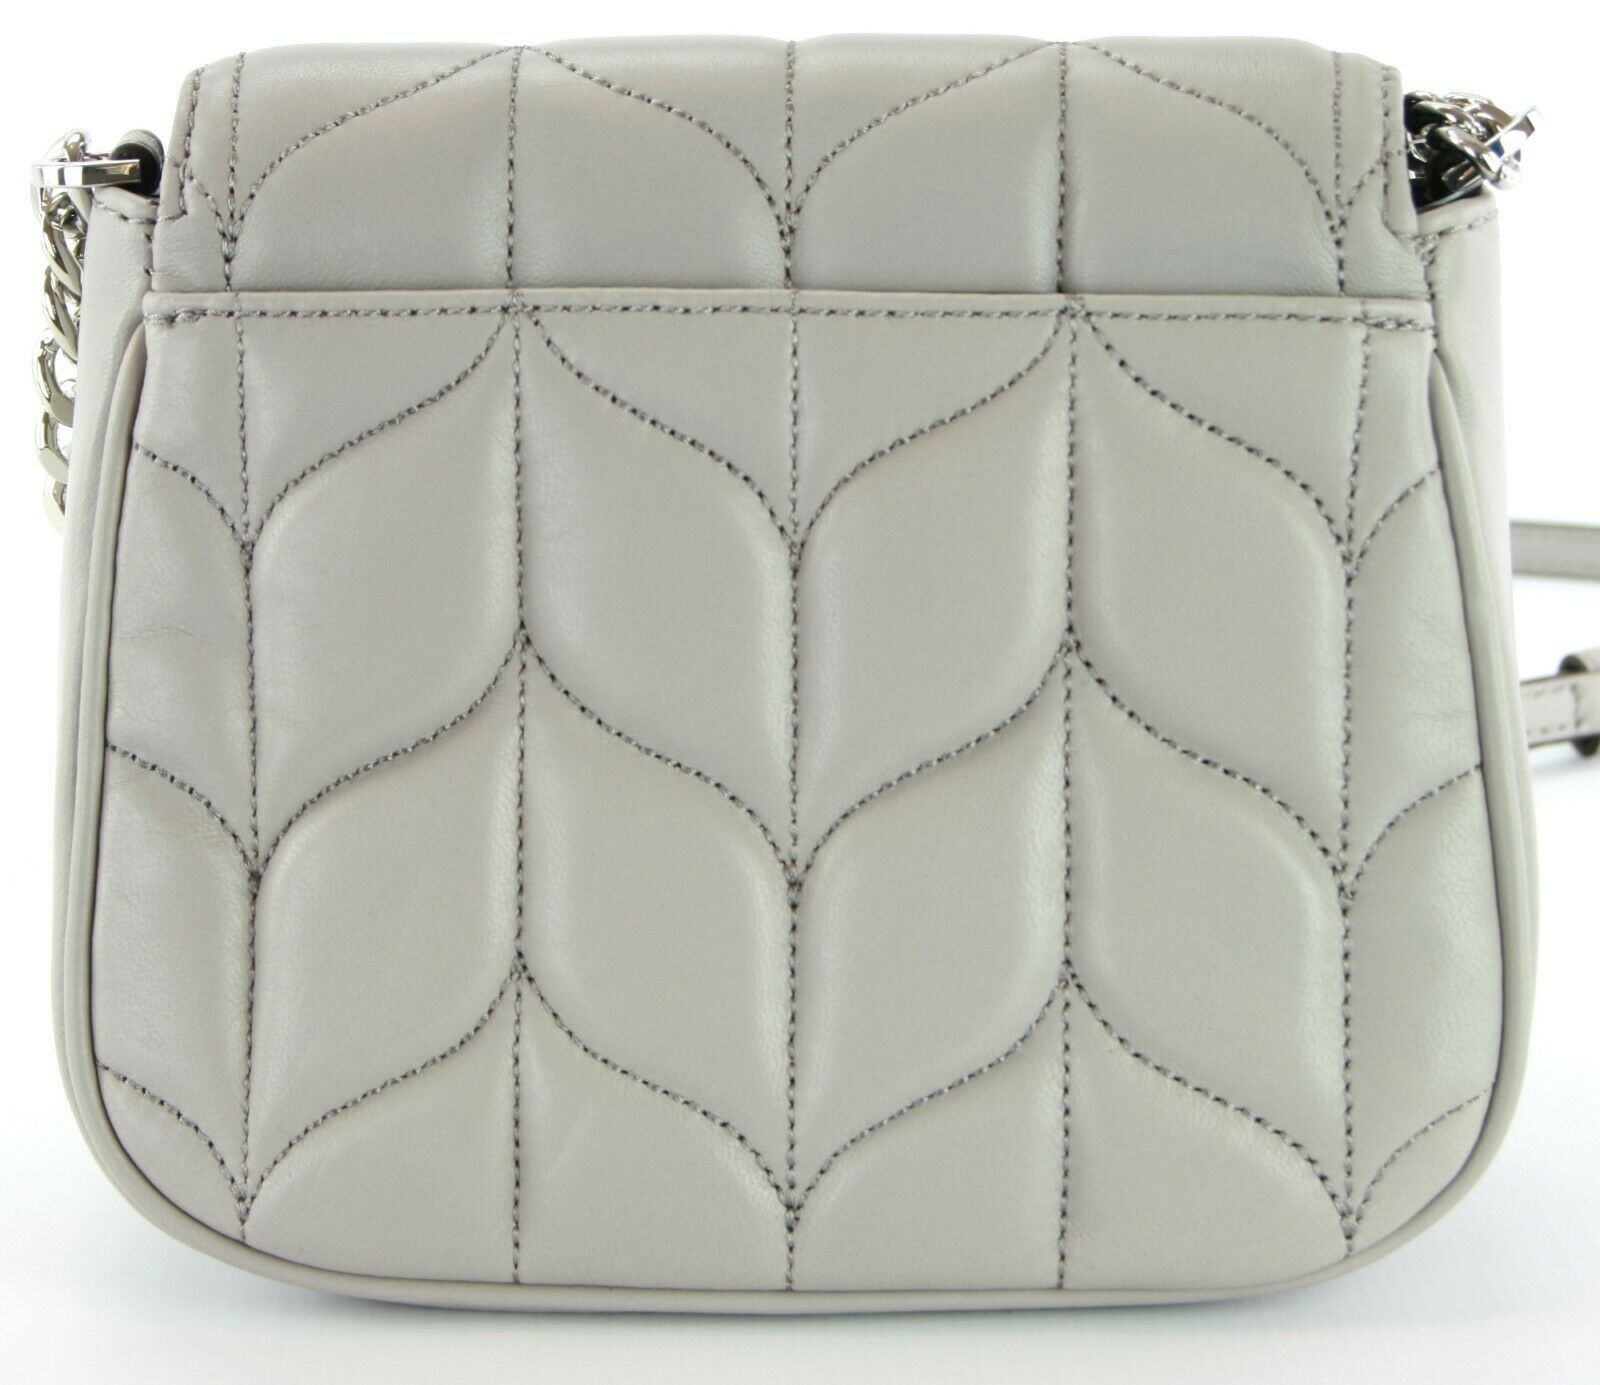 Michael Kors Peyton Quilted Leather Cross Body Bag Small Handbag Grey RRP £270